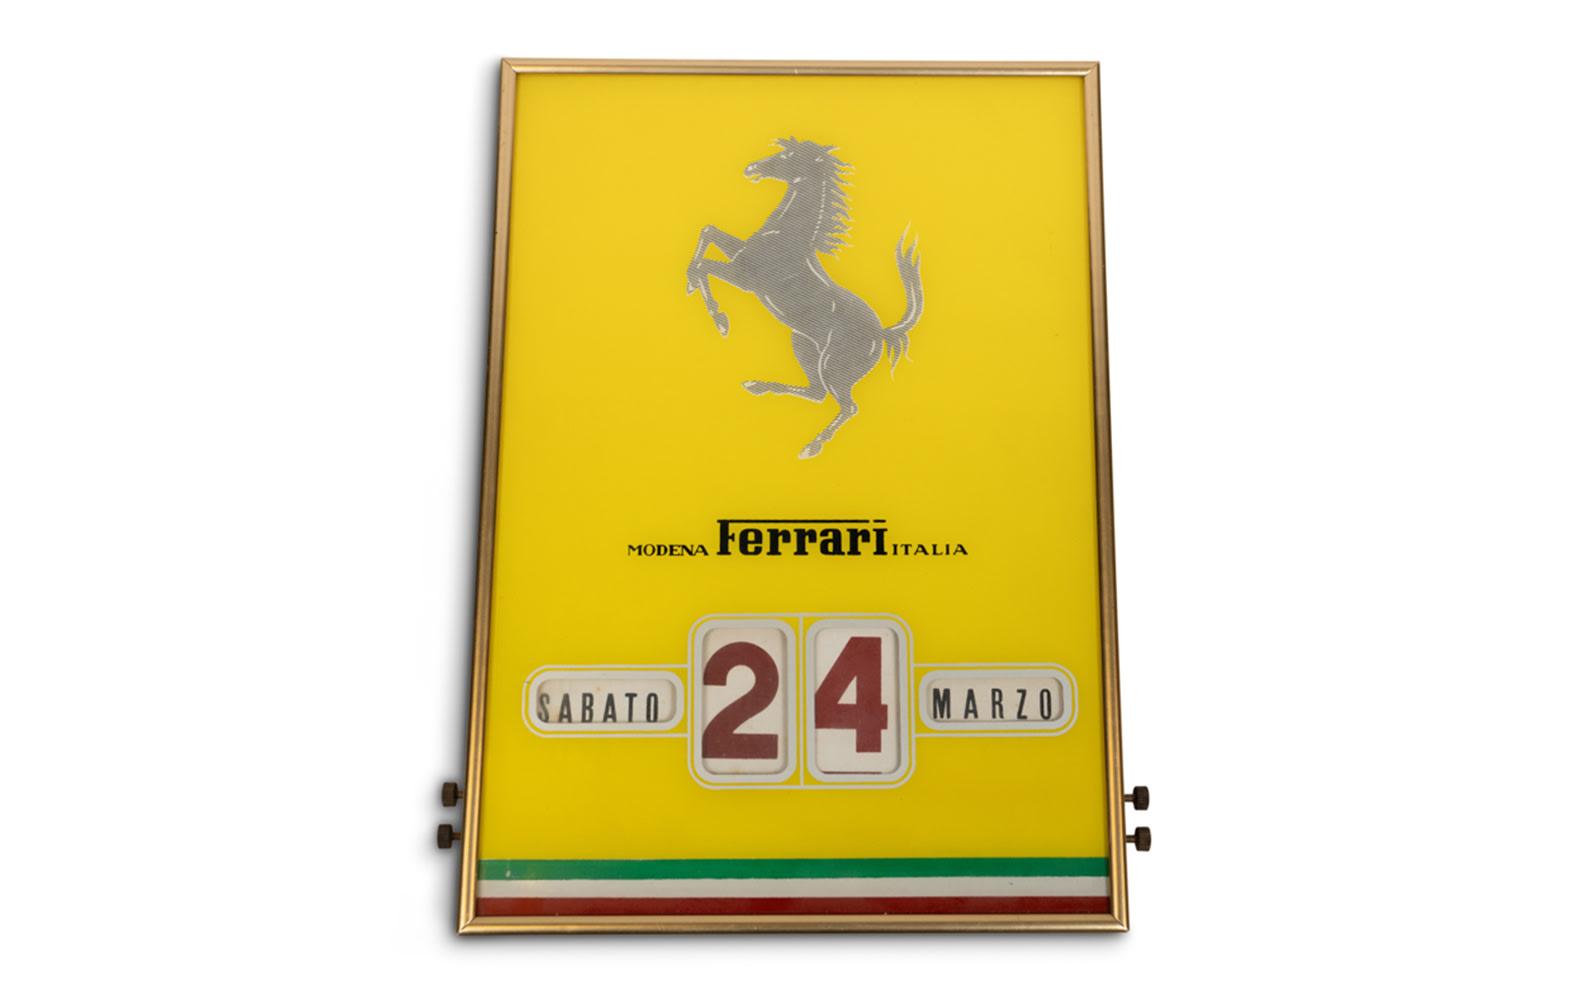 Ferrari Perpetual Calendar, c. 1950s